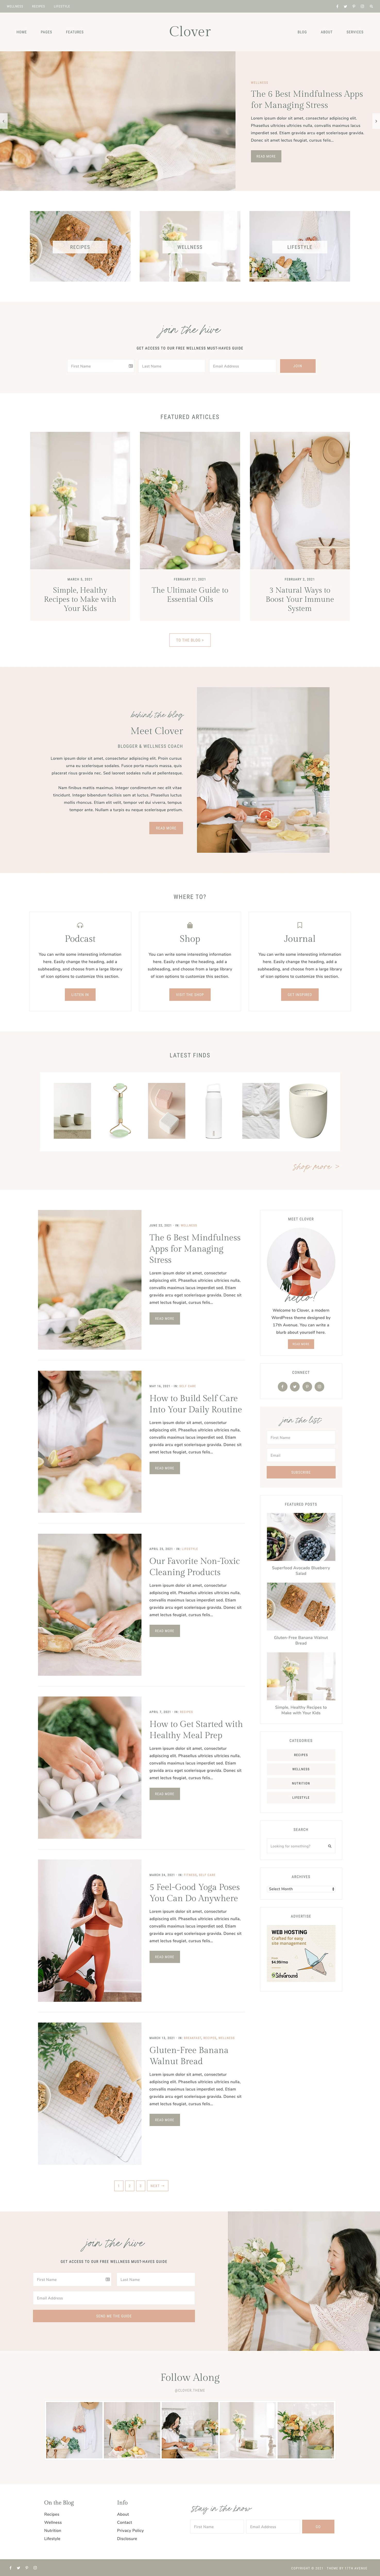 Clover Blog Homepage